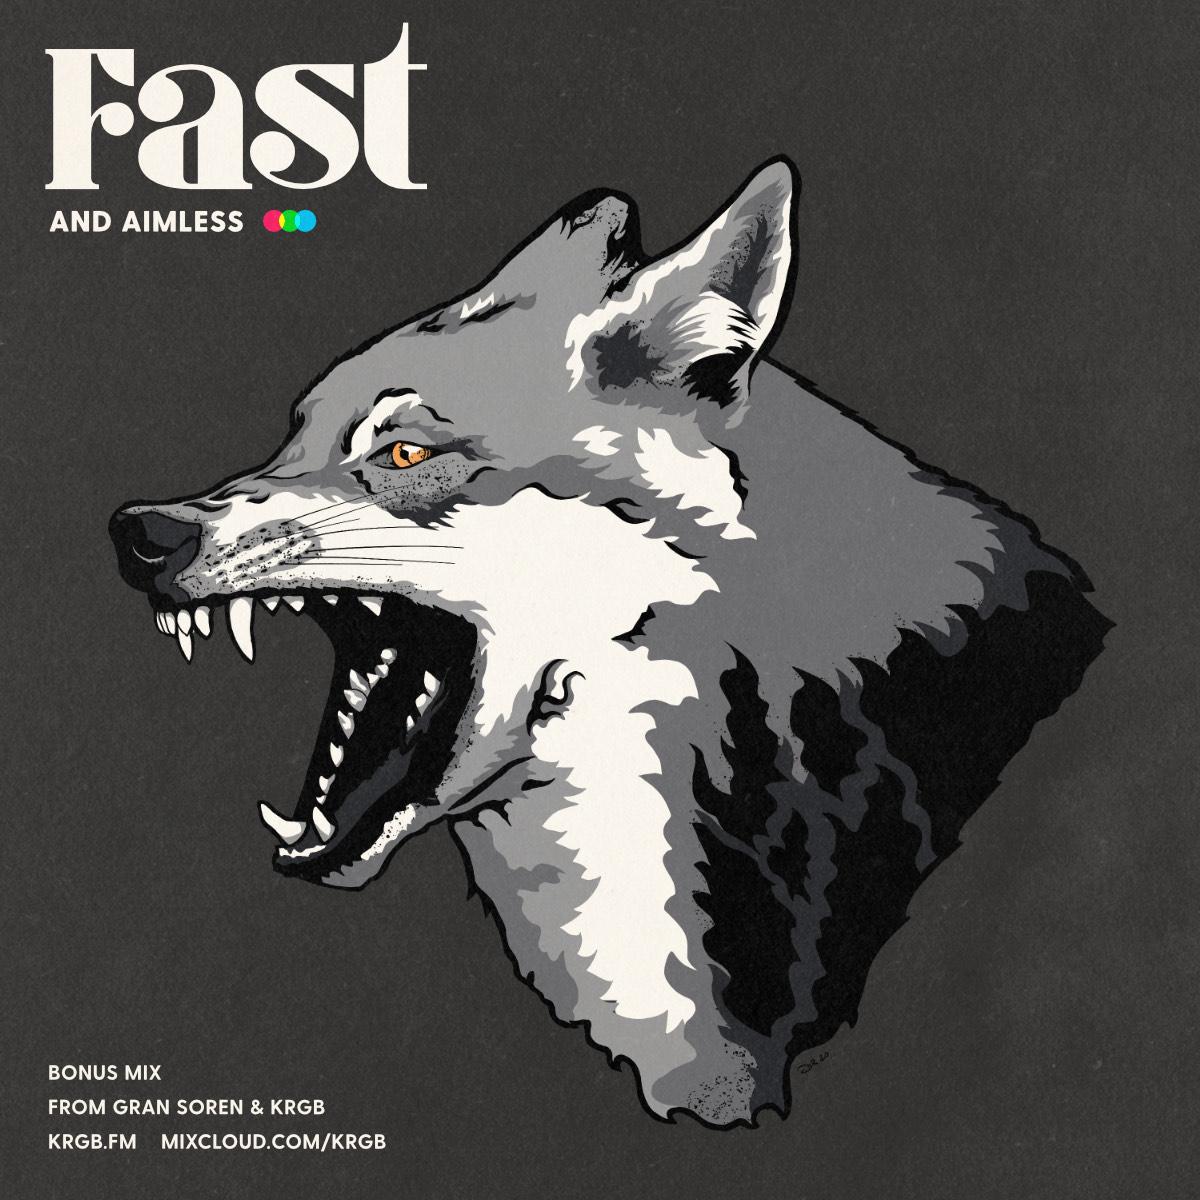 Fast mix show art